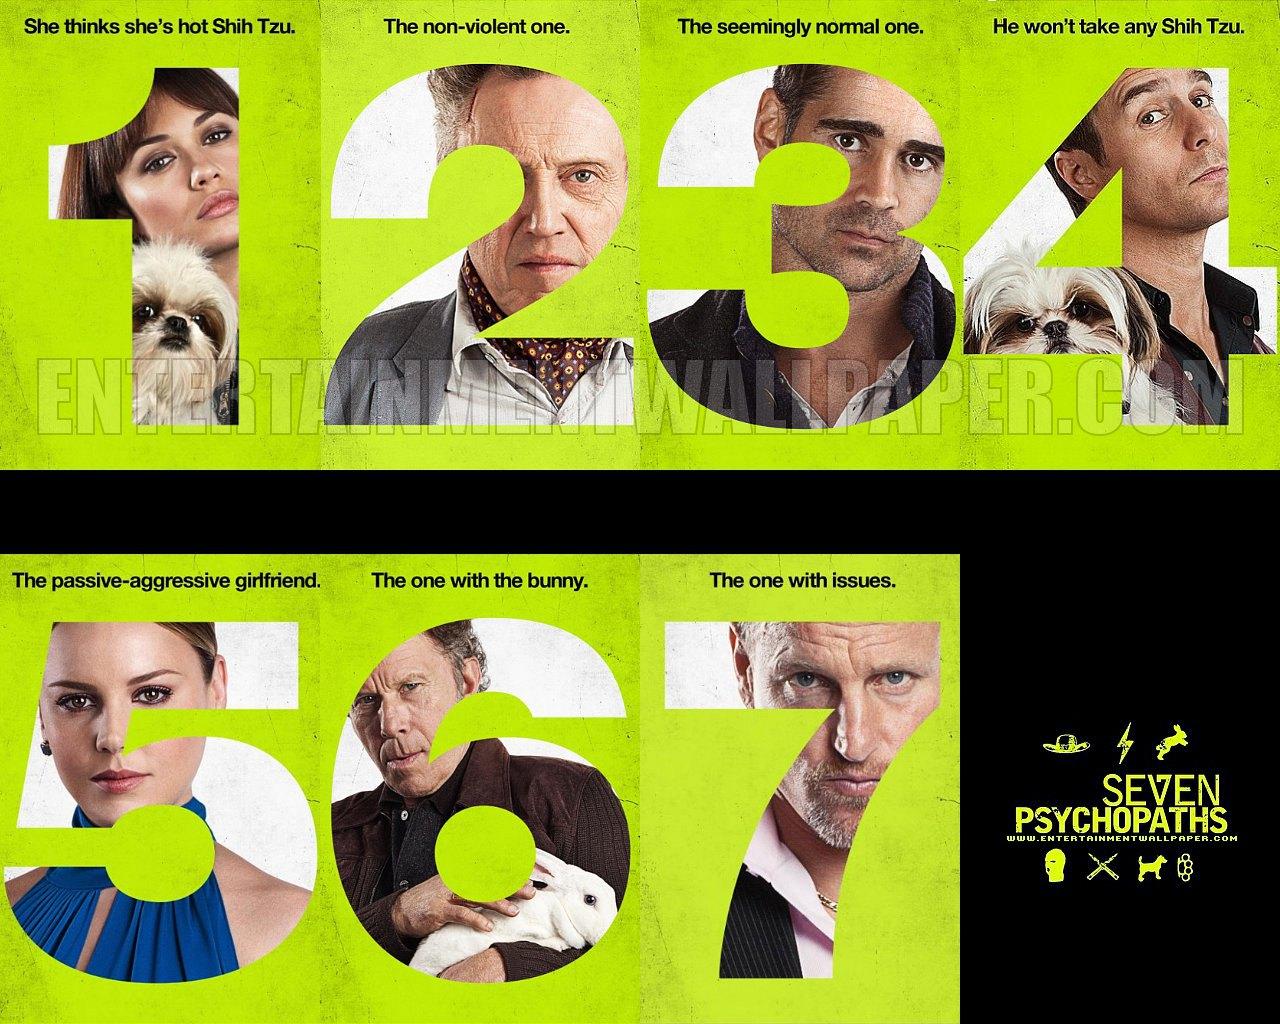 http://4.bp.blogspot.com/-IHRDQdxn1PA/USqxs_NSelI/AAAAAAAAJ2o/kgGU478ZulQ/s1600/Siete+psicopatas+-+seven-psychopaths02-1-2-3-4-5-6-7.jpg